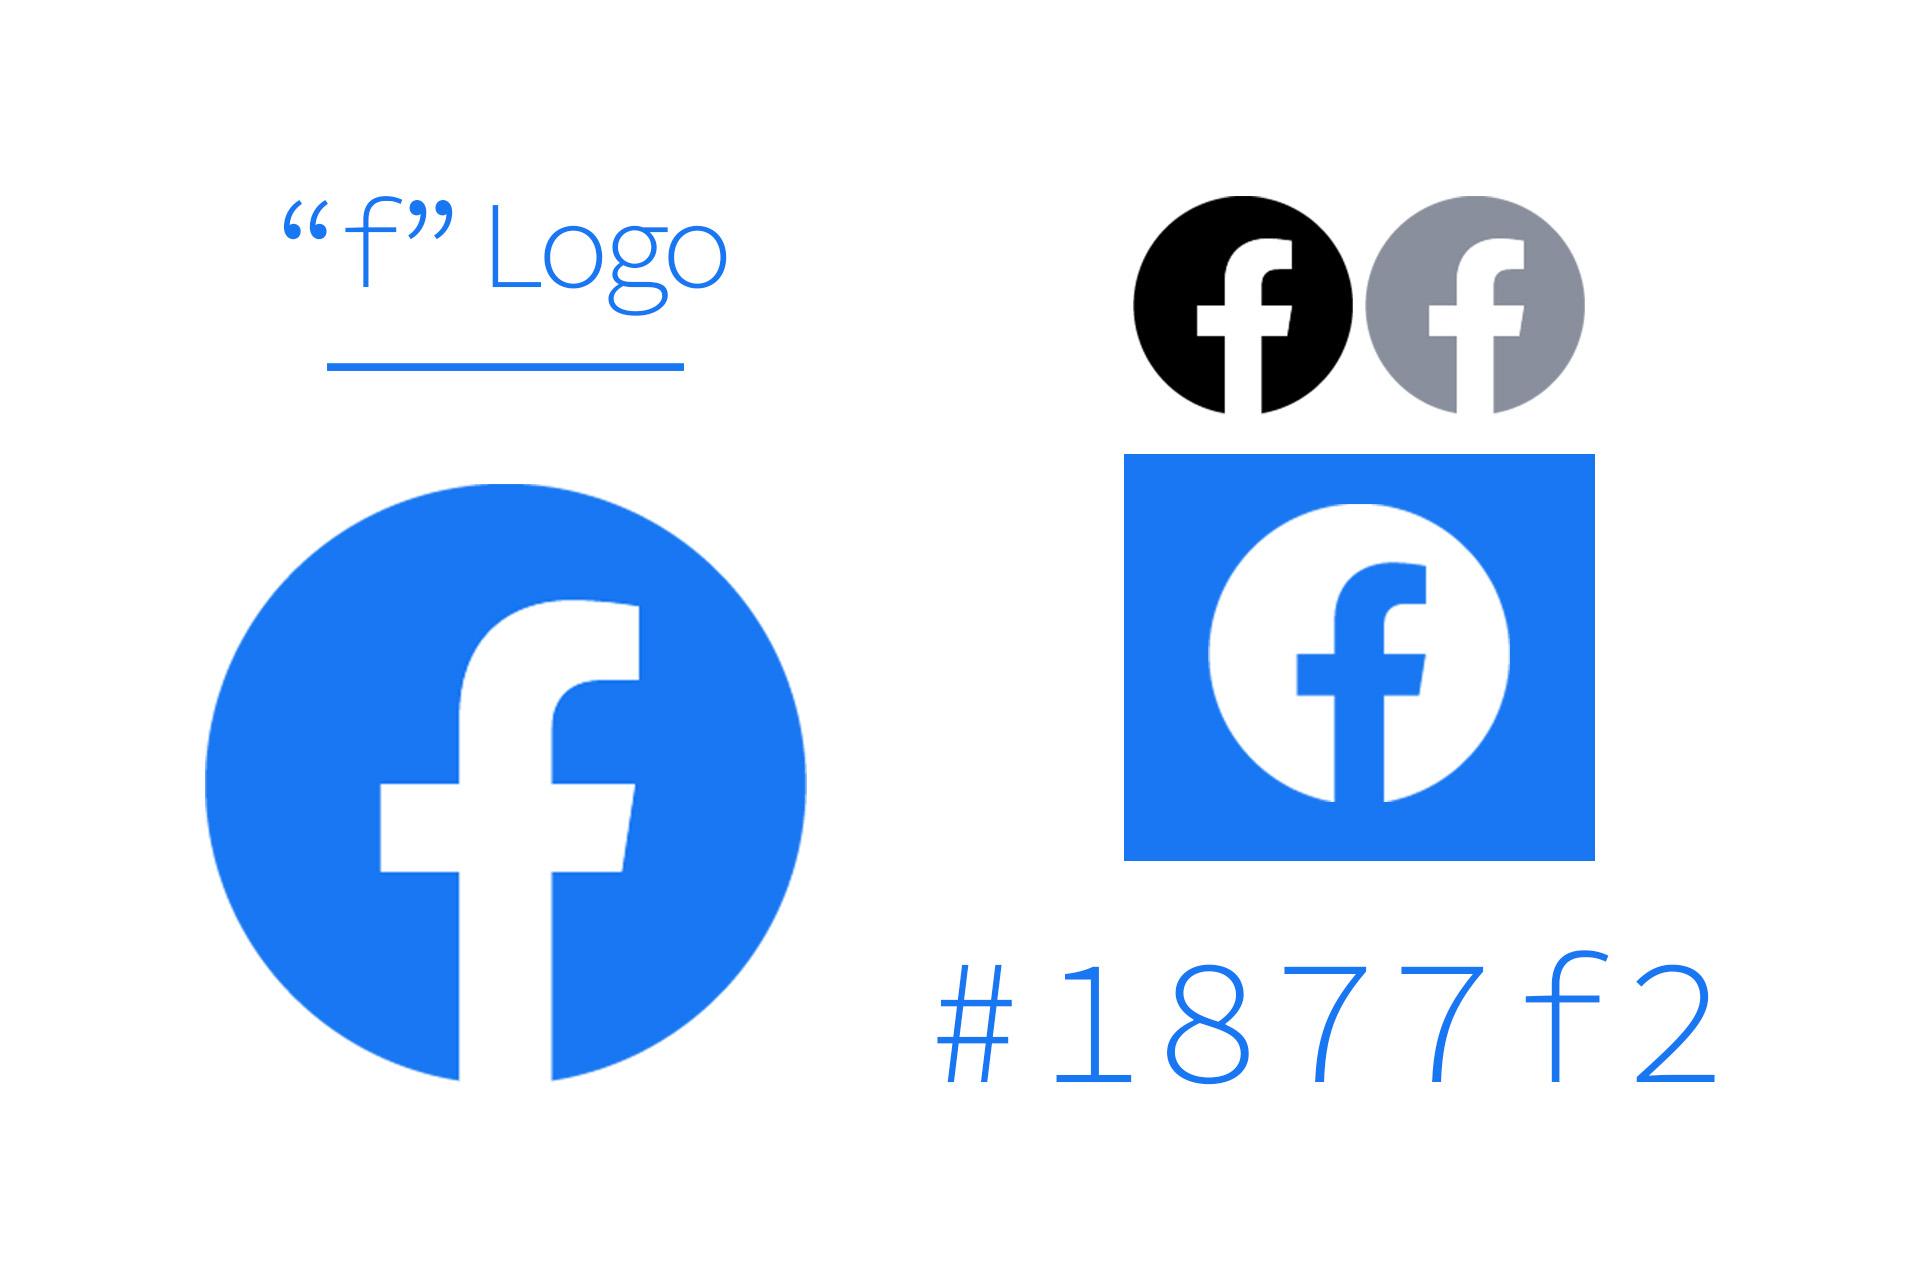 Facebookの新しい公式ロゴと色[2020年最新]